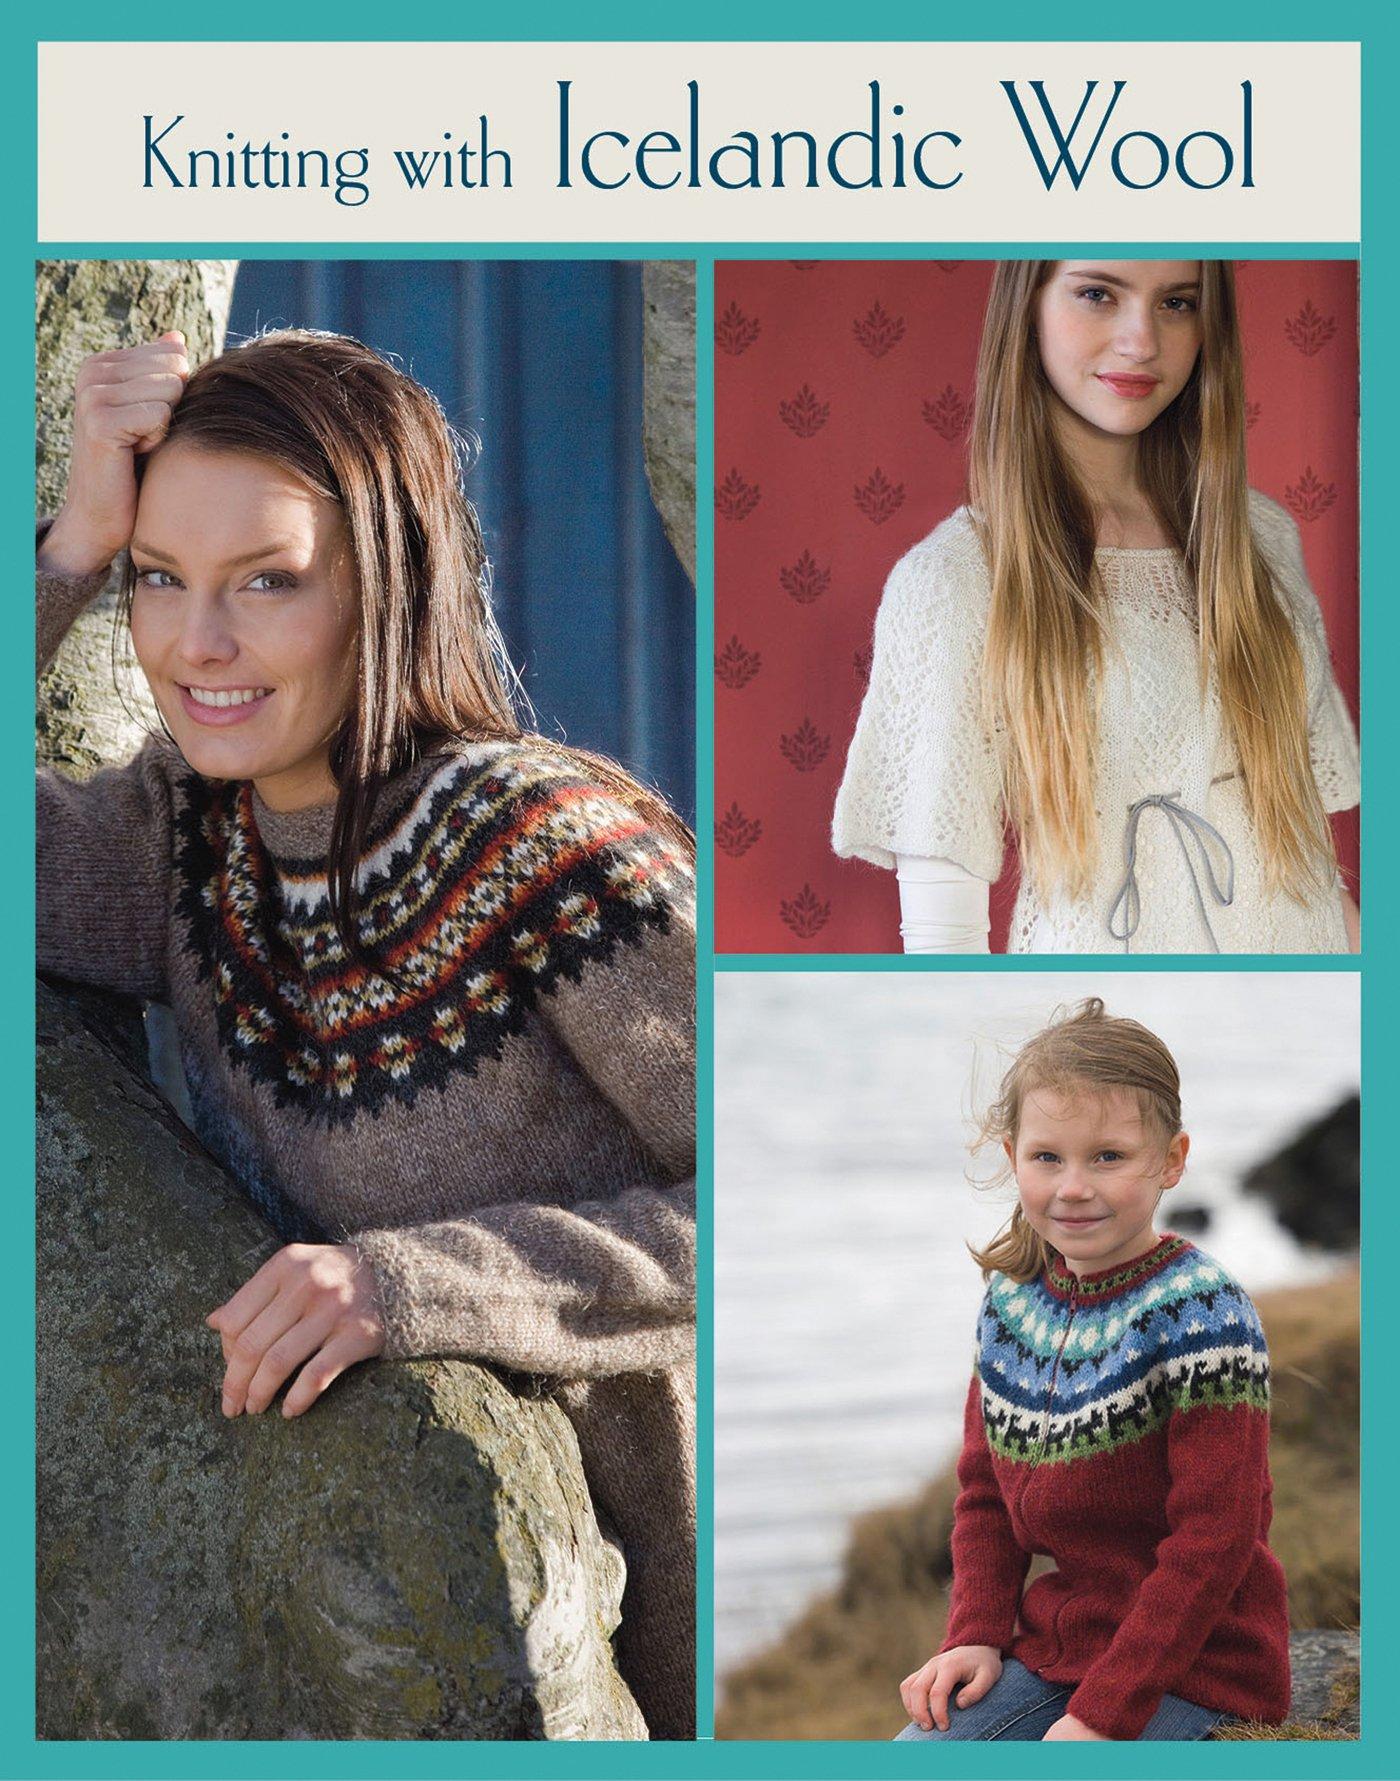 dd43ad0b083 Knitting with Icelandic Wool (Knit & Crochet): Vedis Jonsdottir ...